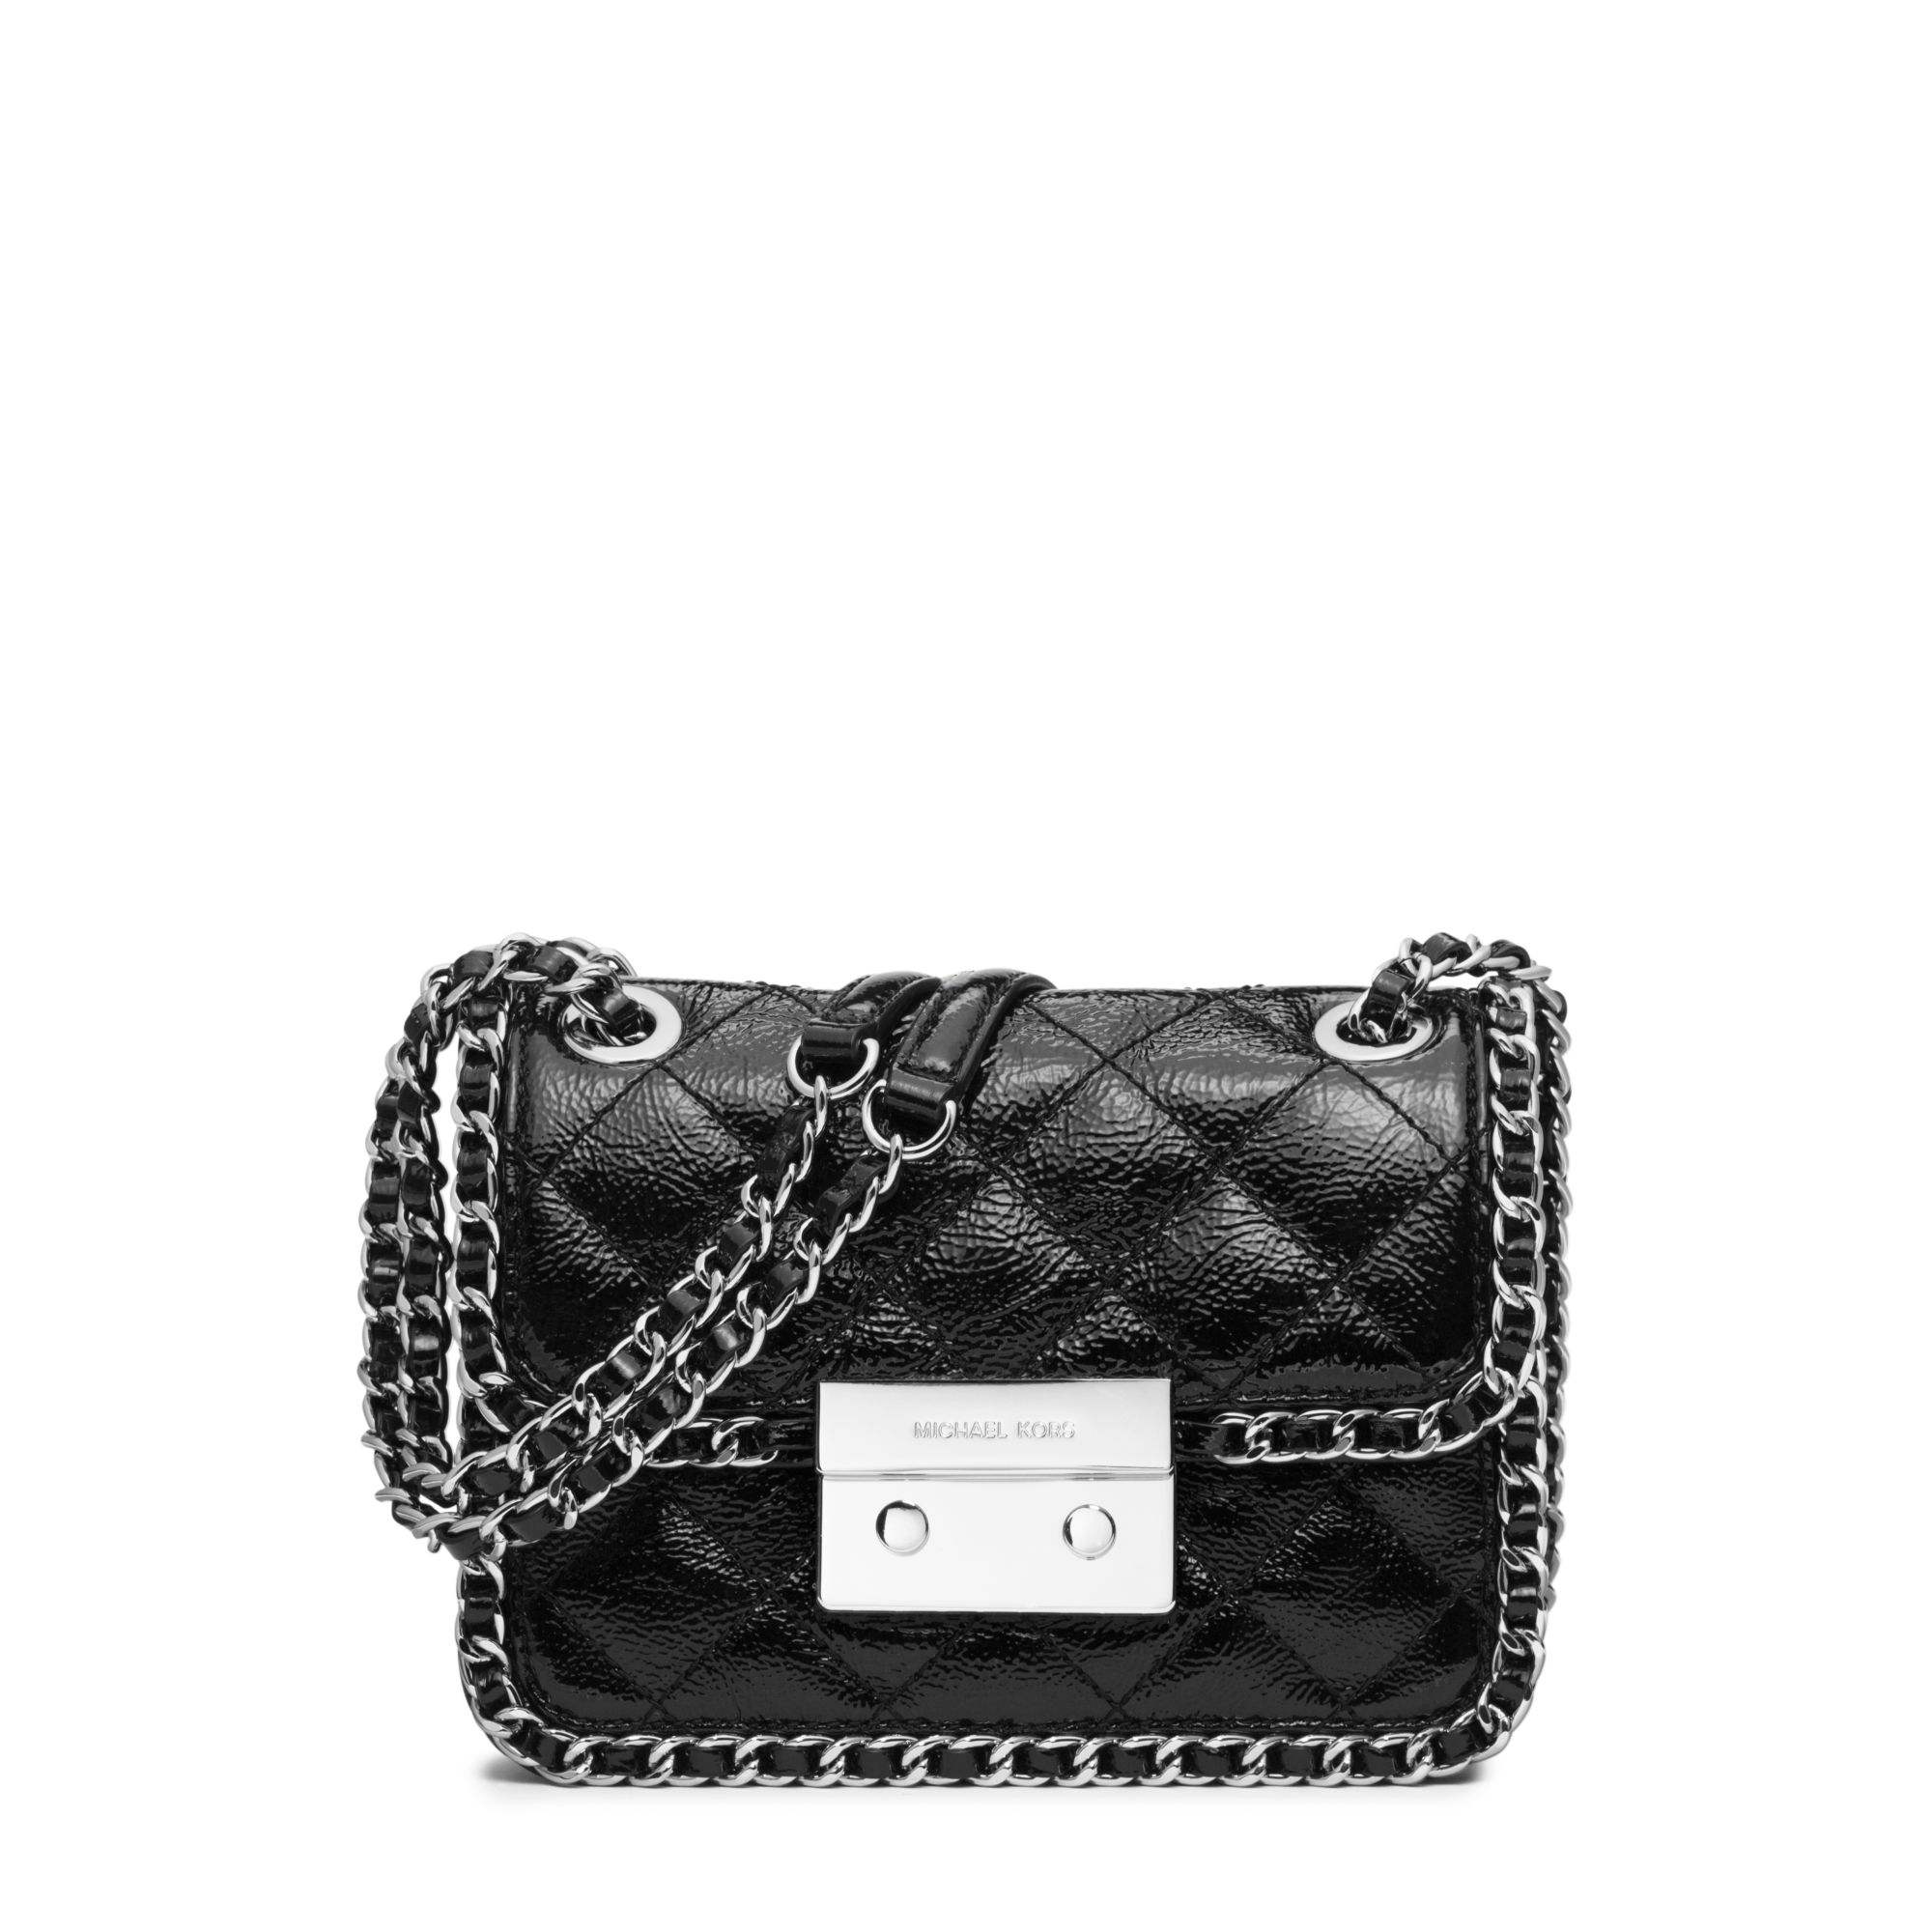 58fbc56b1d59 Michael Kors Carine Medium Quilted-leather Shoulder Bag in Black - Lyst